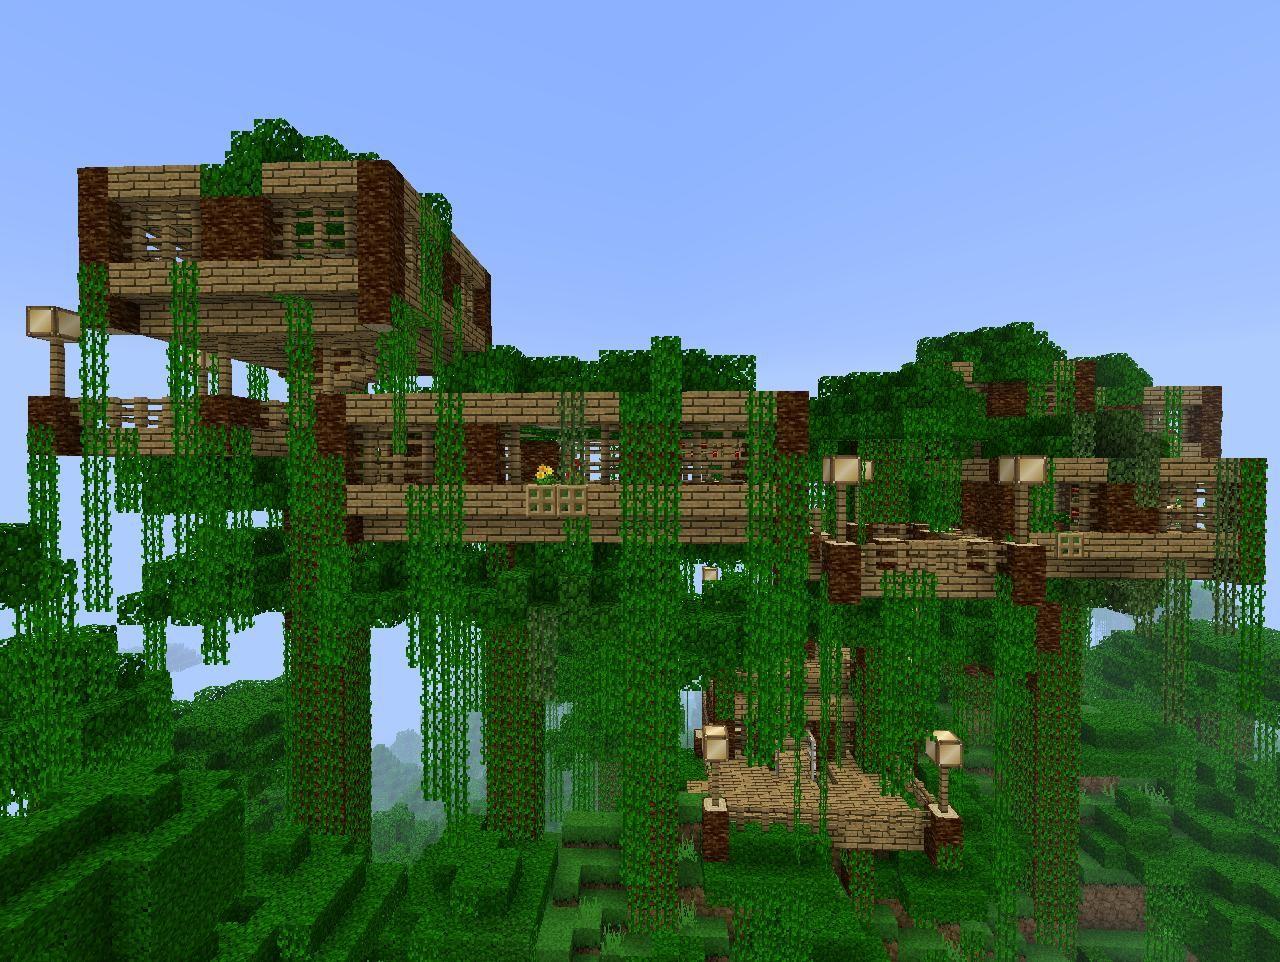 Green Minecraft Home Ideas